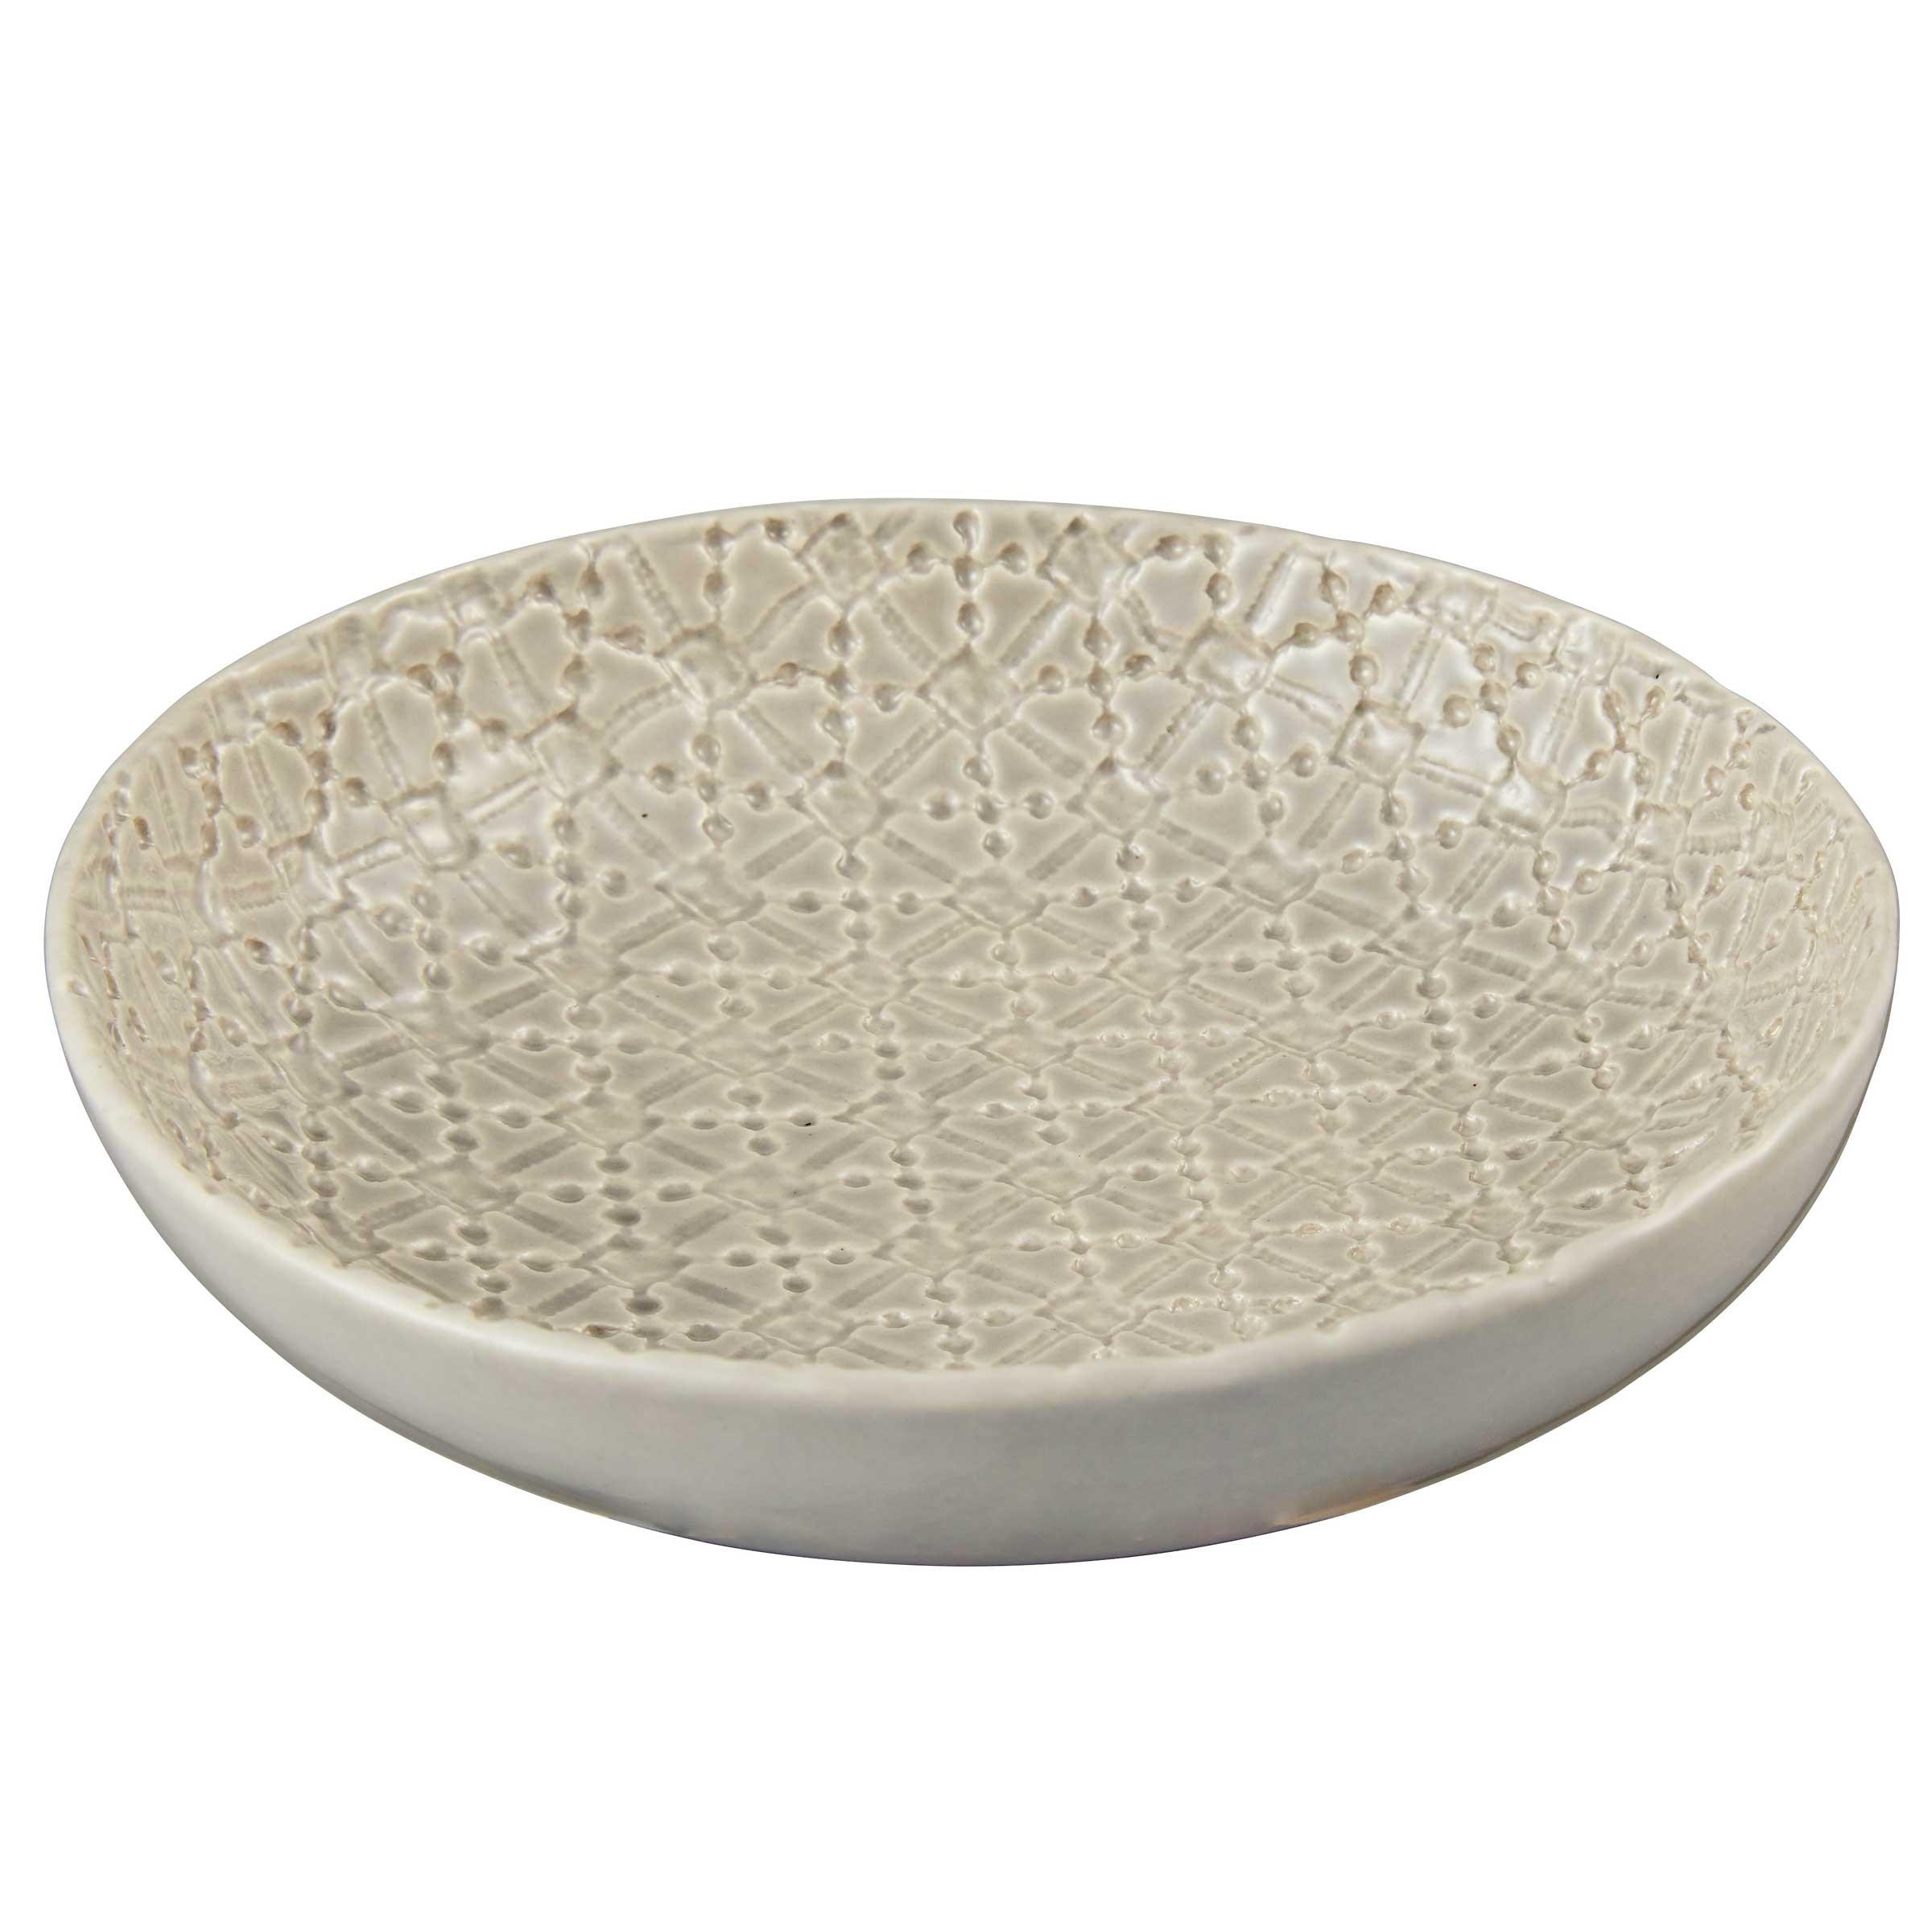 grey-pasta-bowl_1.jpg